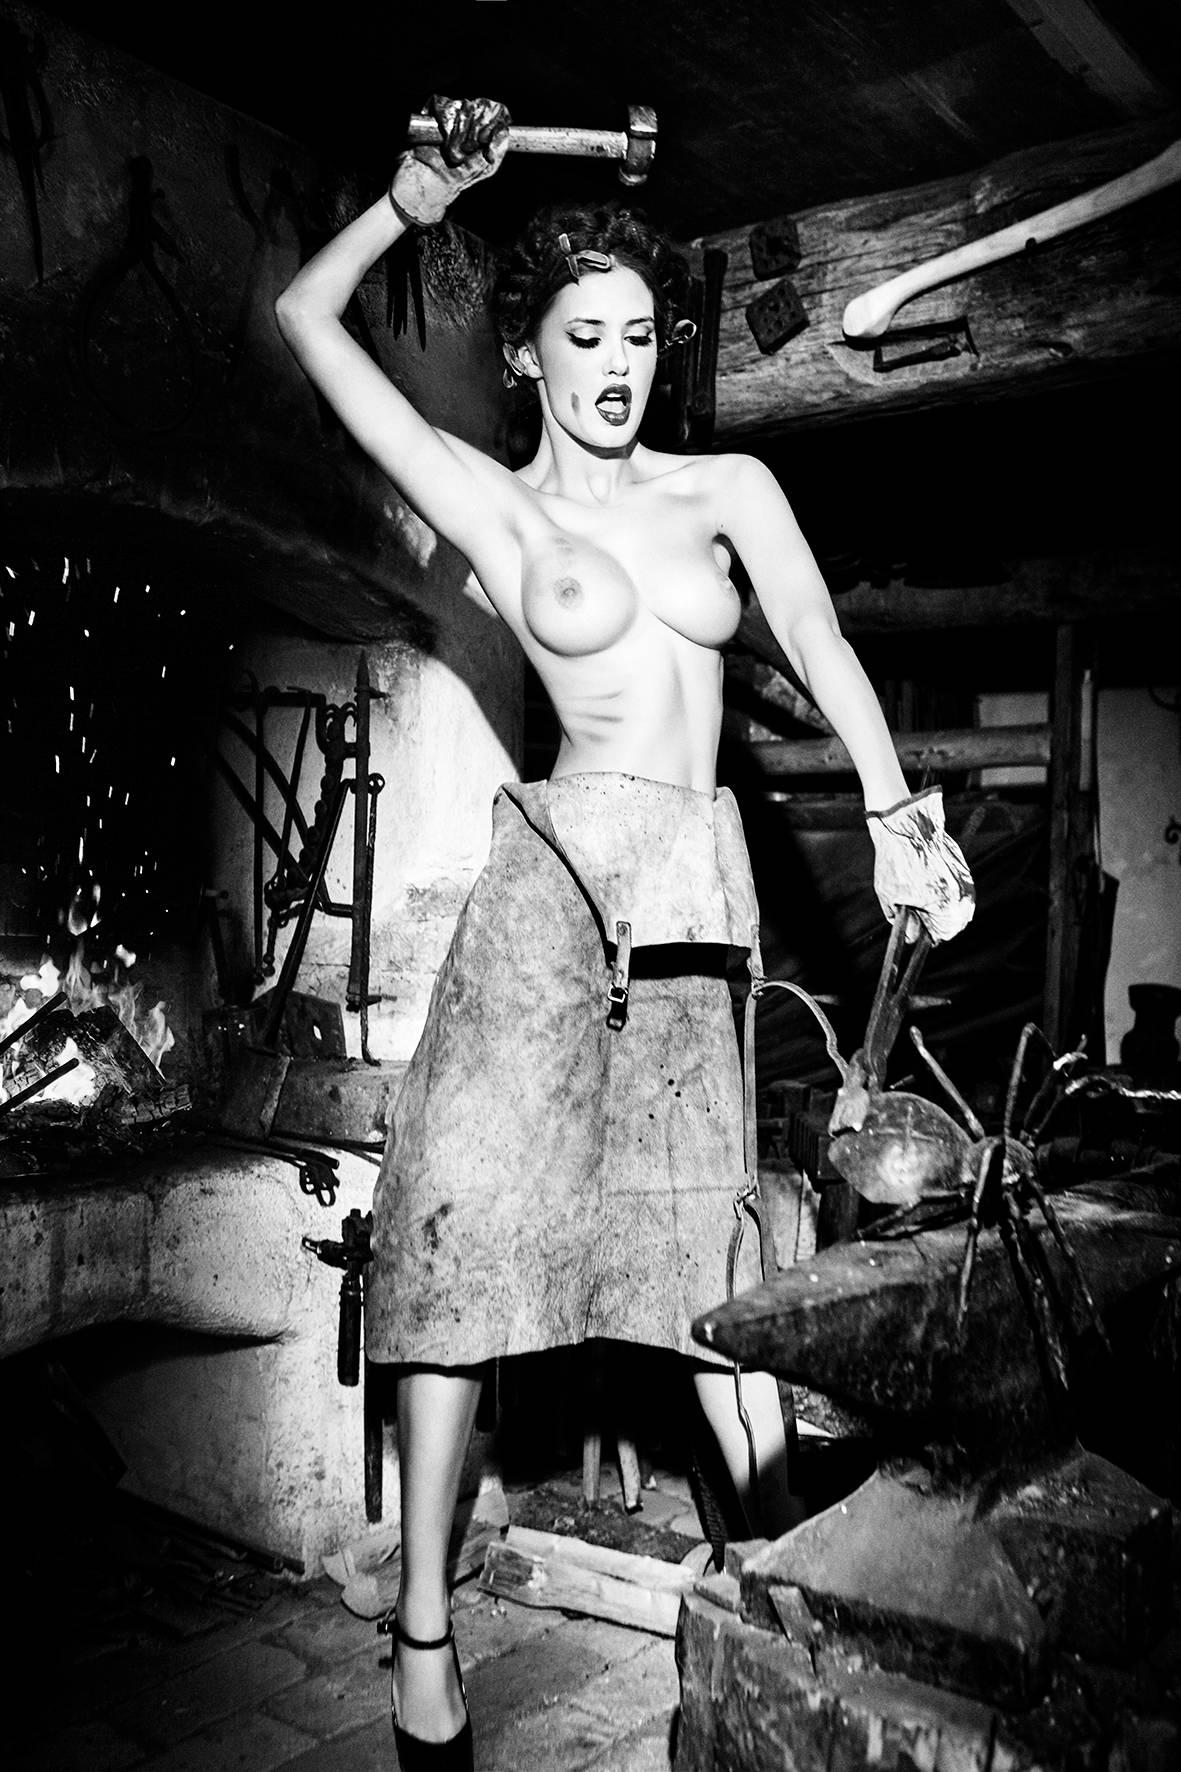 Beating It While It's Hot, Bavaria, Black & White Photography, Fine Art Print